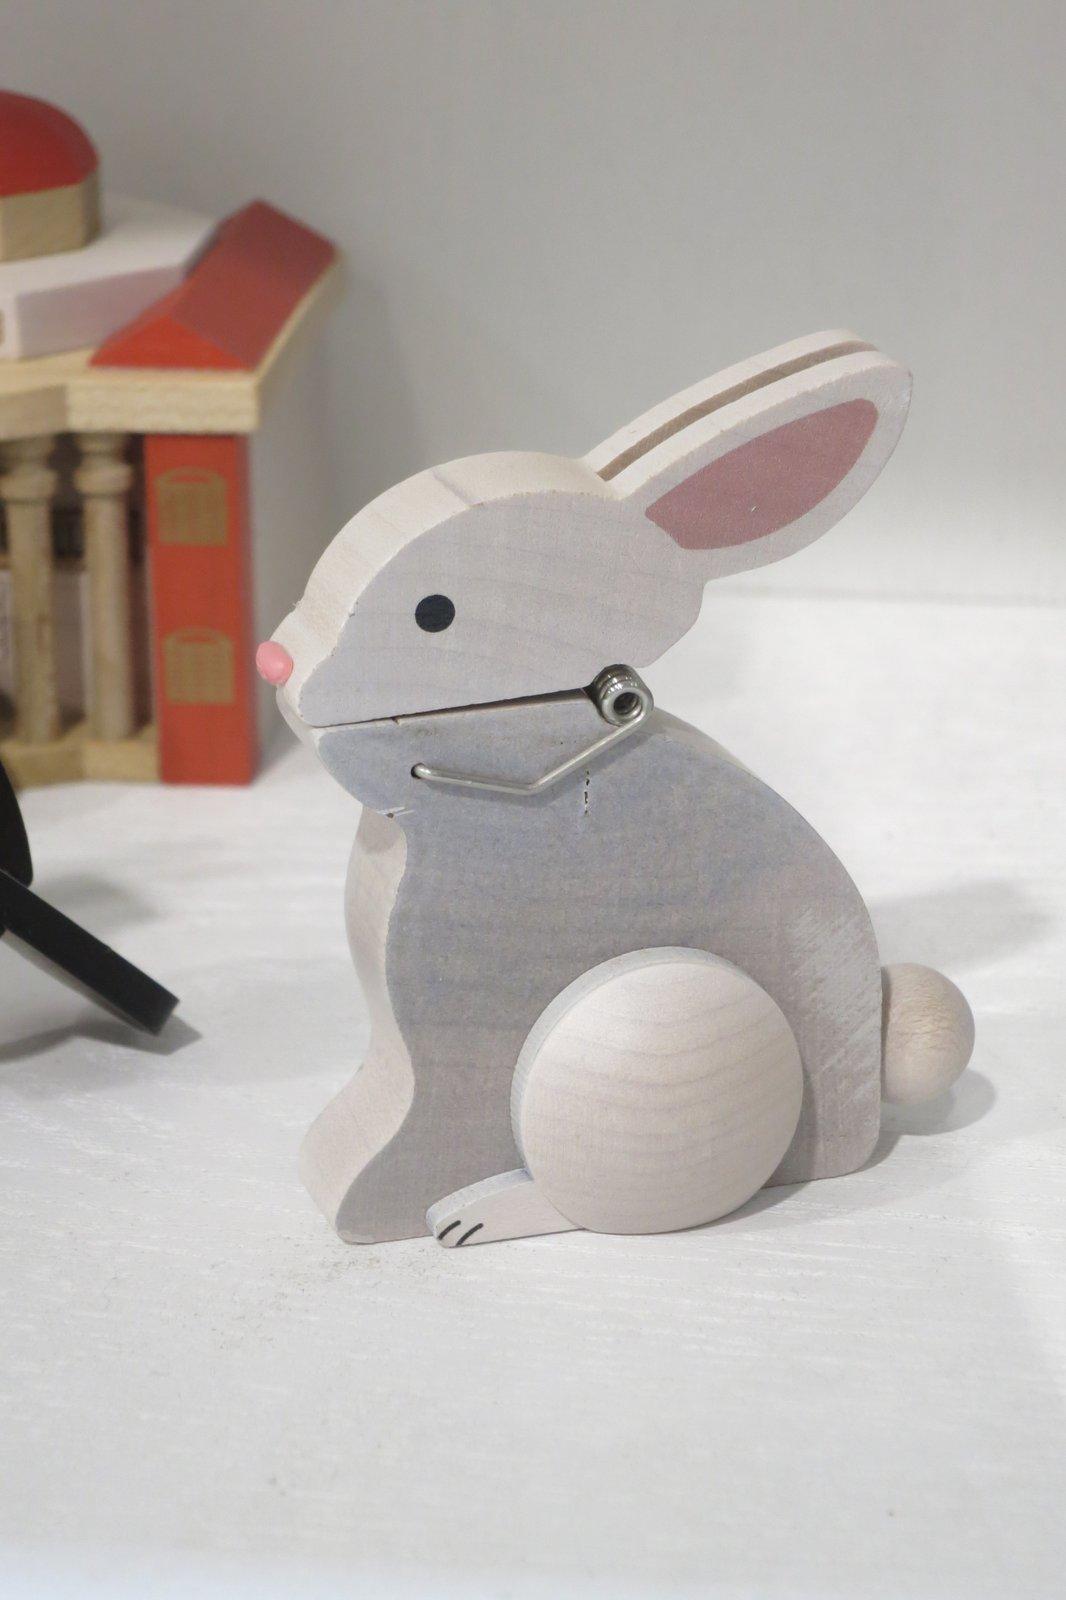 Cindy Derosier My Creative Life Rabbit Crafts And Craft